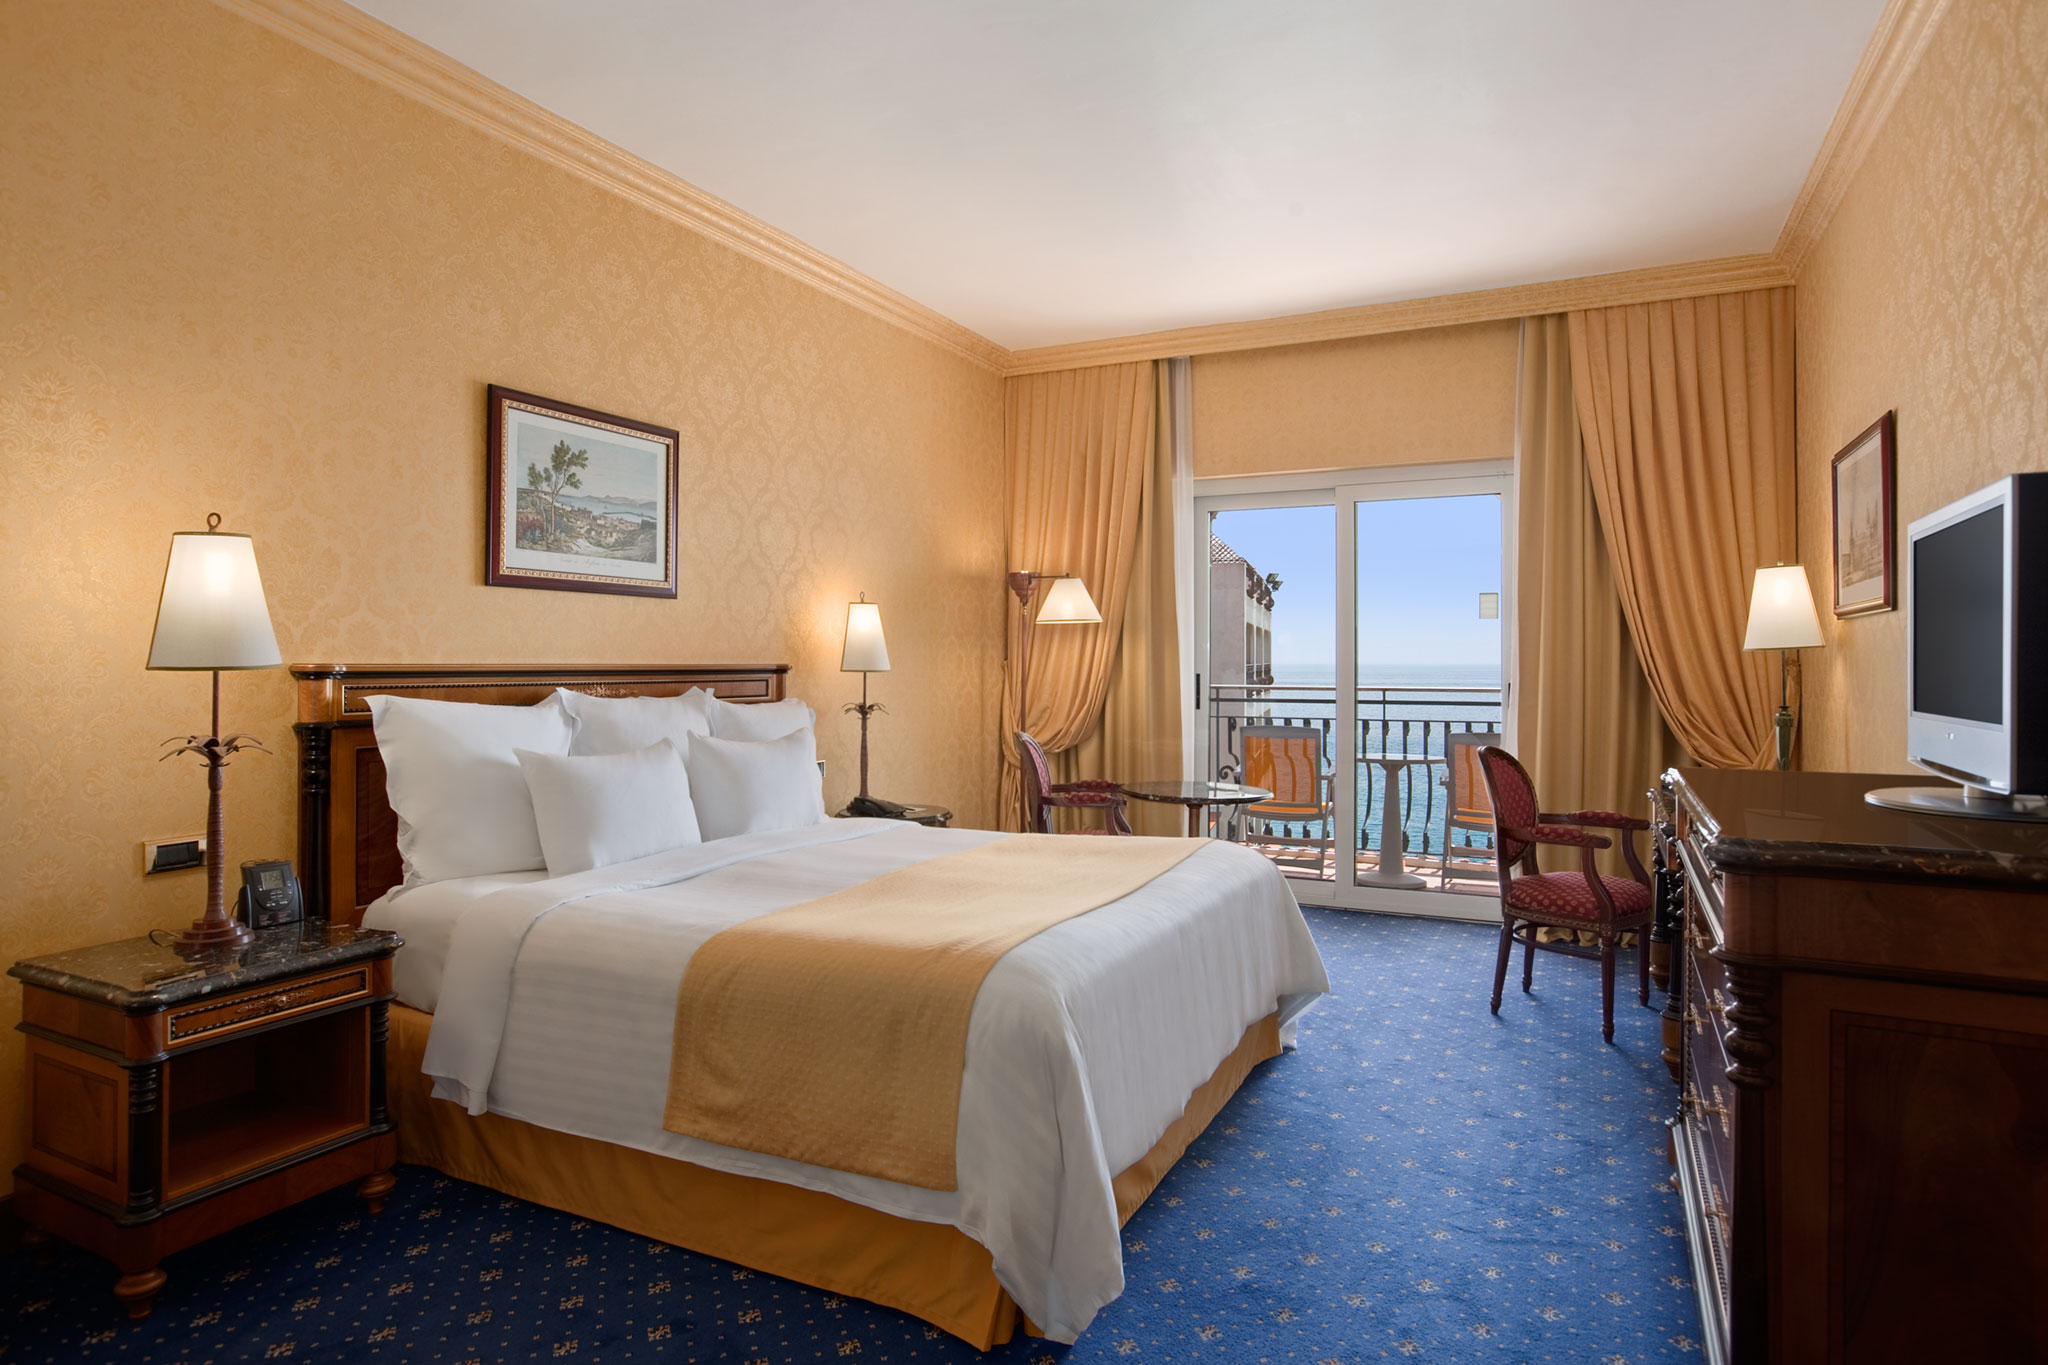 Elegante hotel in sicilia e giardini naxos hilton for Hilton hotel italia